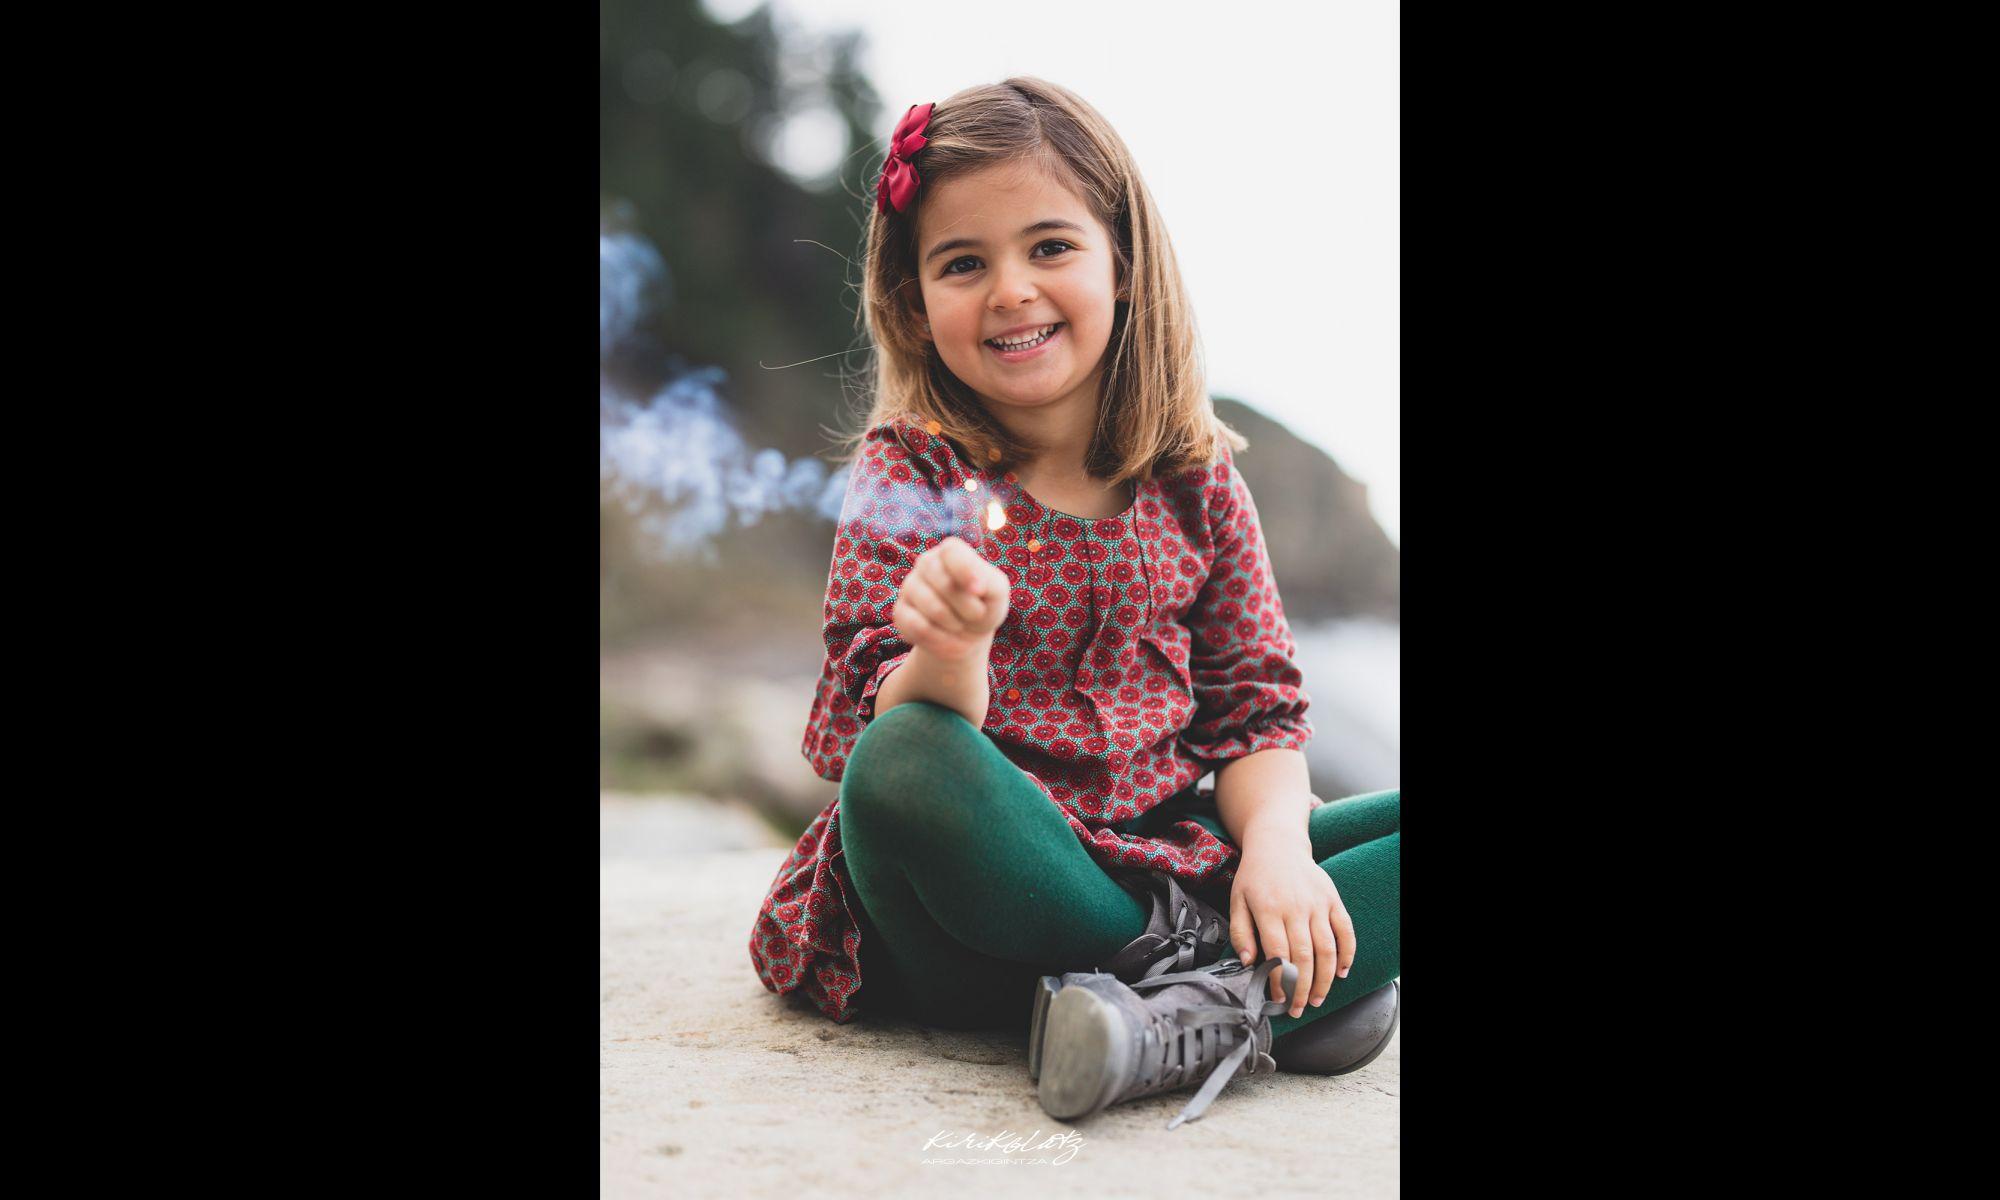 Fotografia Infantil Sesiones Fotos Bizkaia Kirikolatz Fotografa